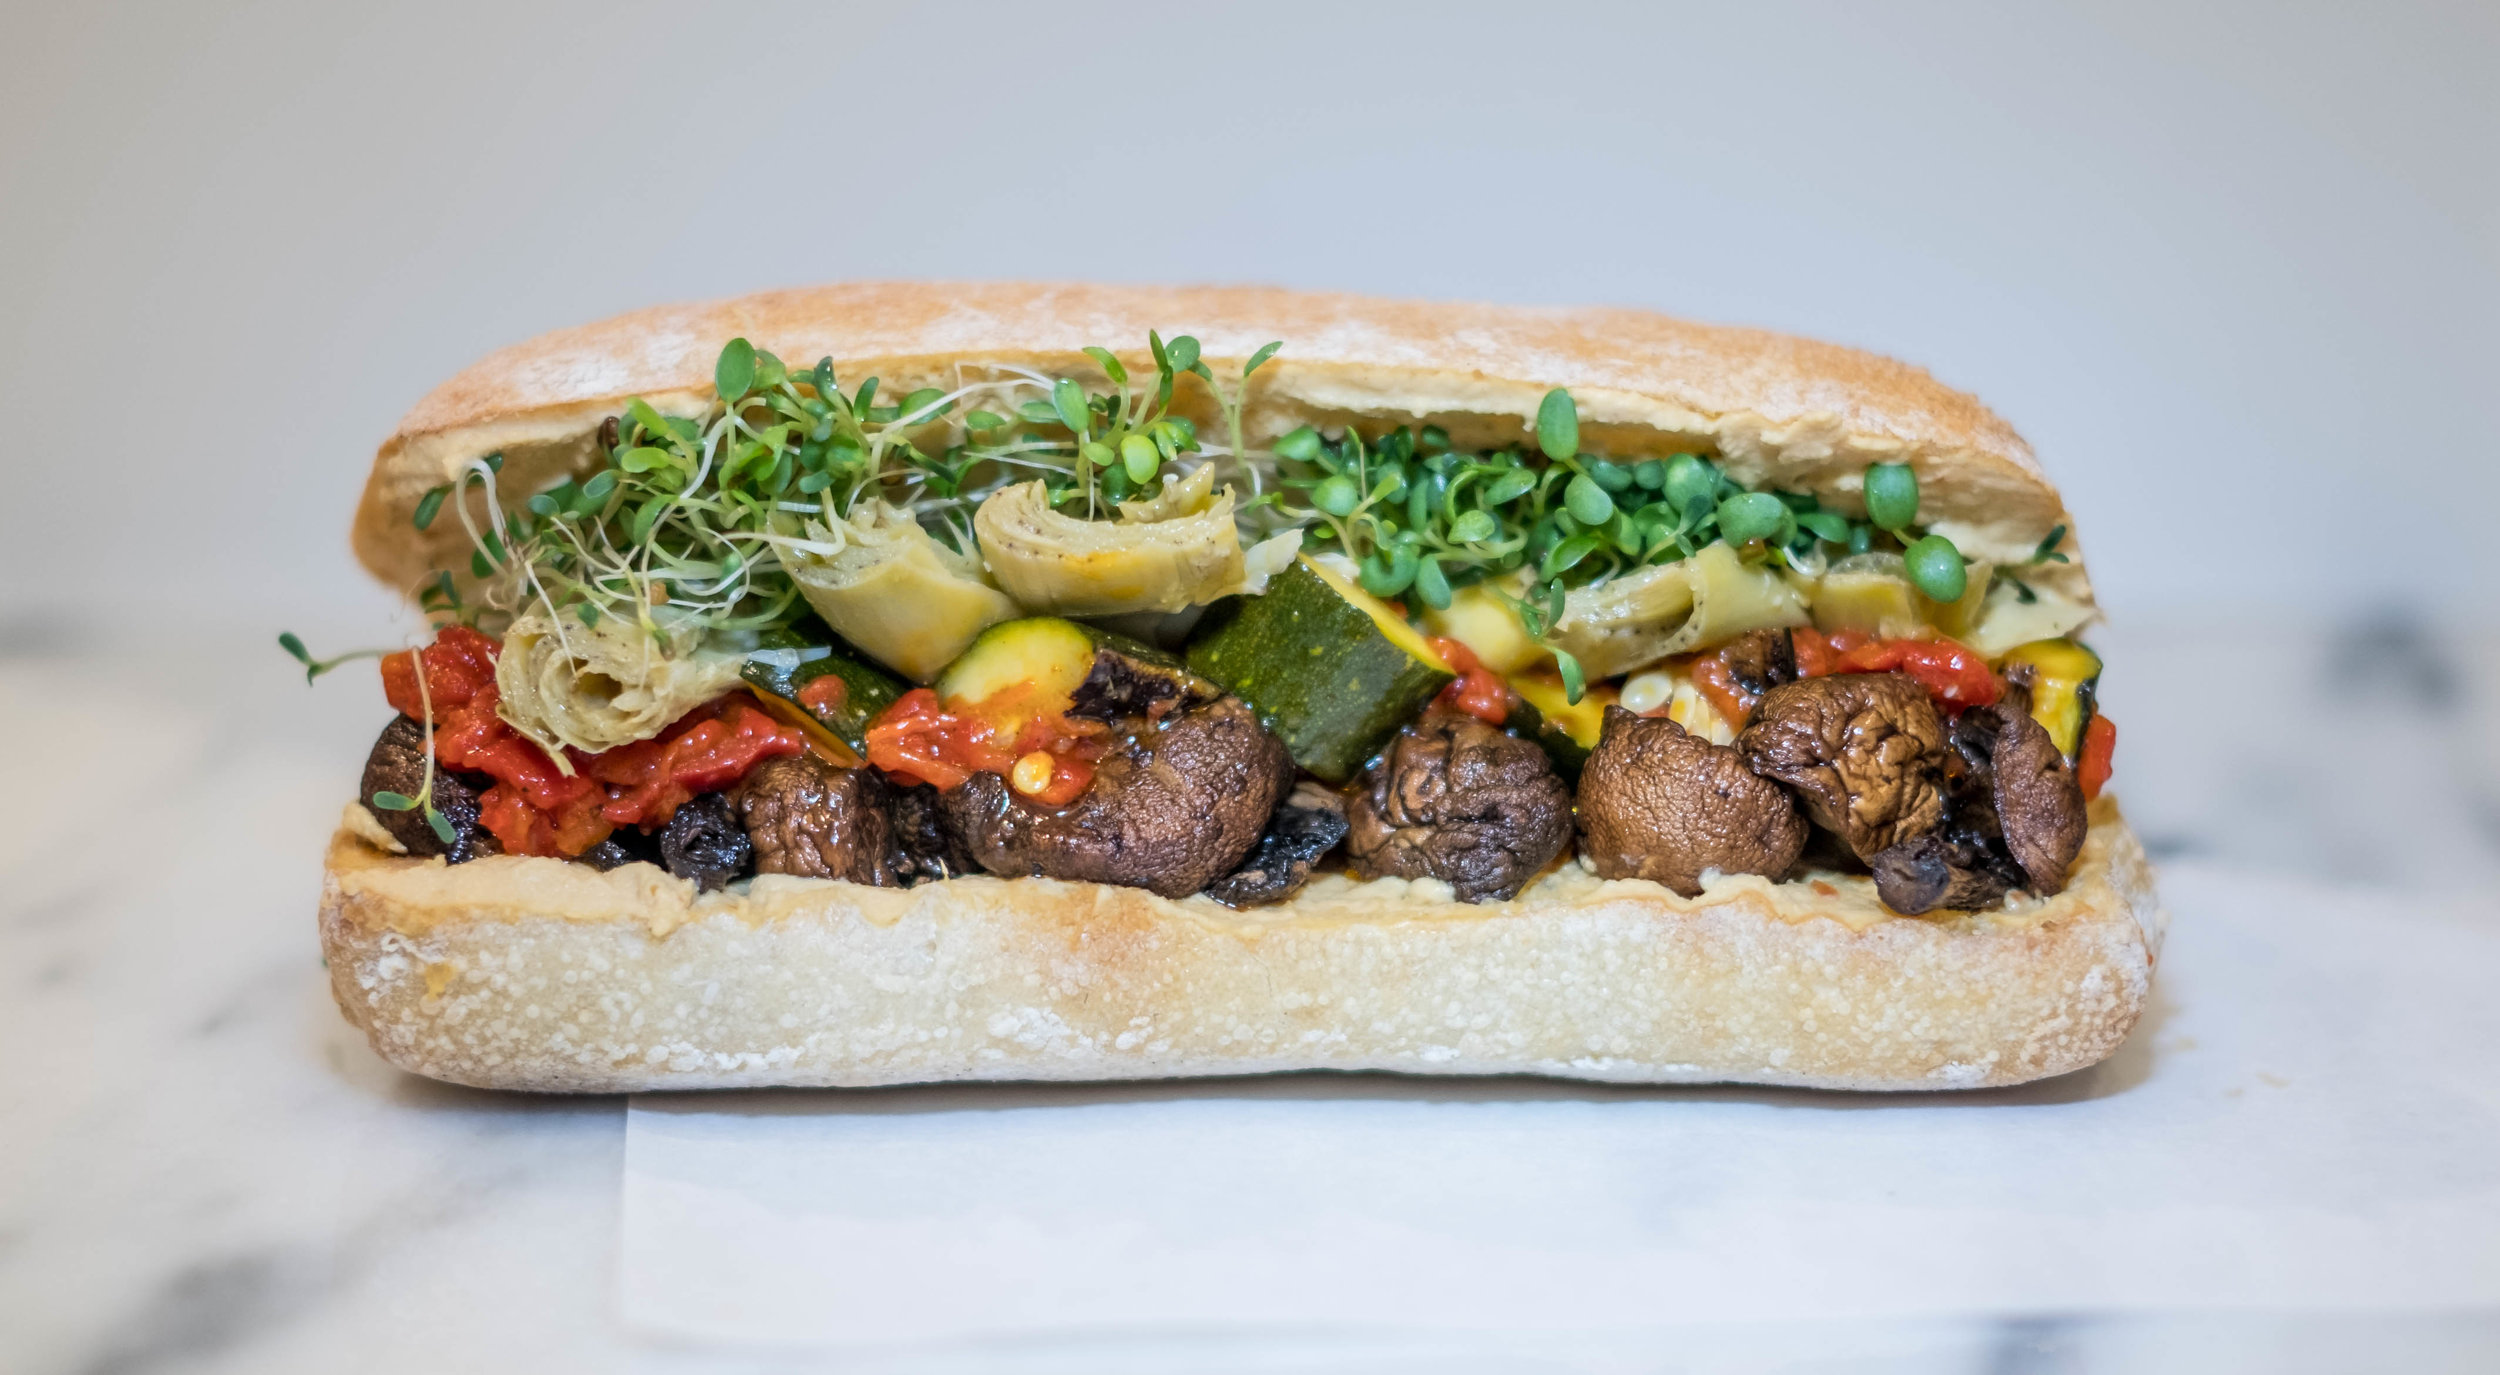 Veggies + Hummus - ROASTED MUSHROOMS, MISO CHARRED ZUCCHINI, PIQUILLO PEPPERS, ARTICHOKES, LEMON-HARISSA HUMMUS, ALFALFA SPROUTS, CIABATTA (VEGAN)